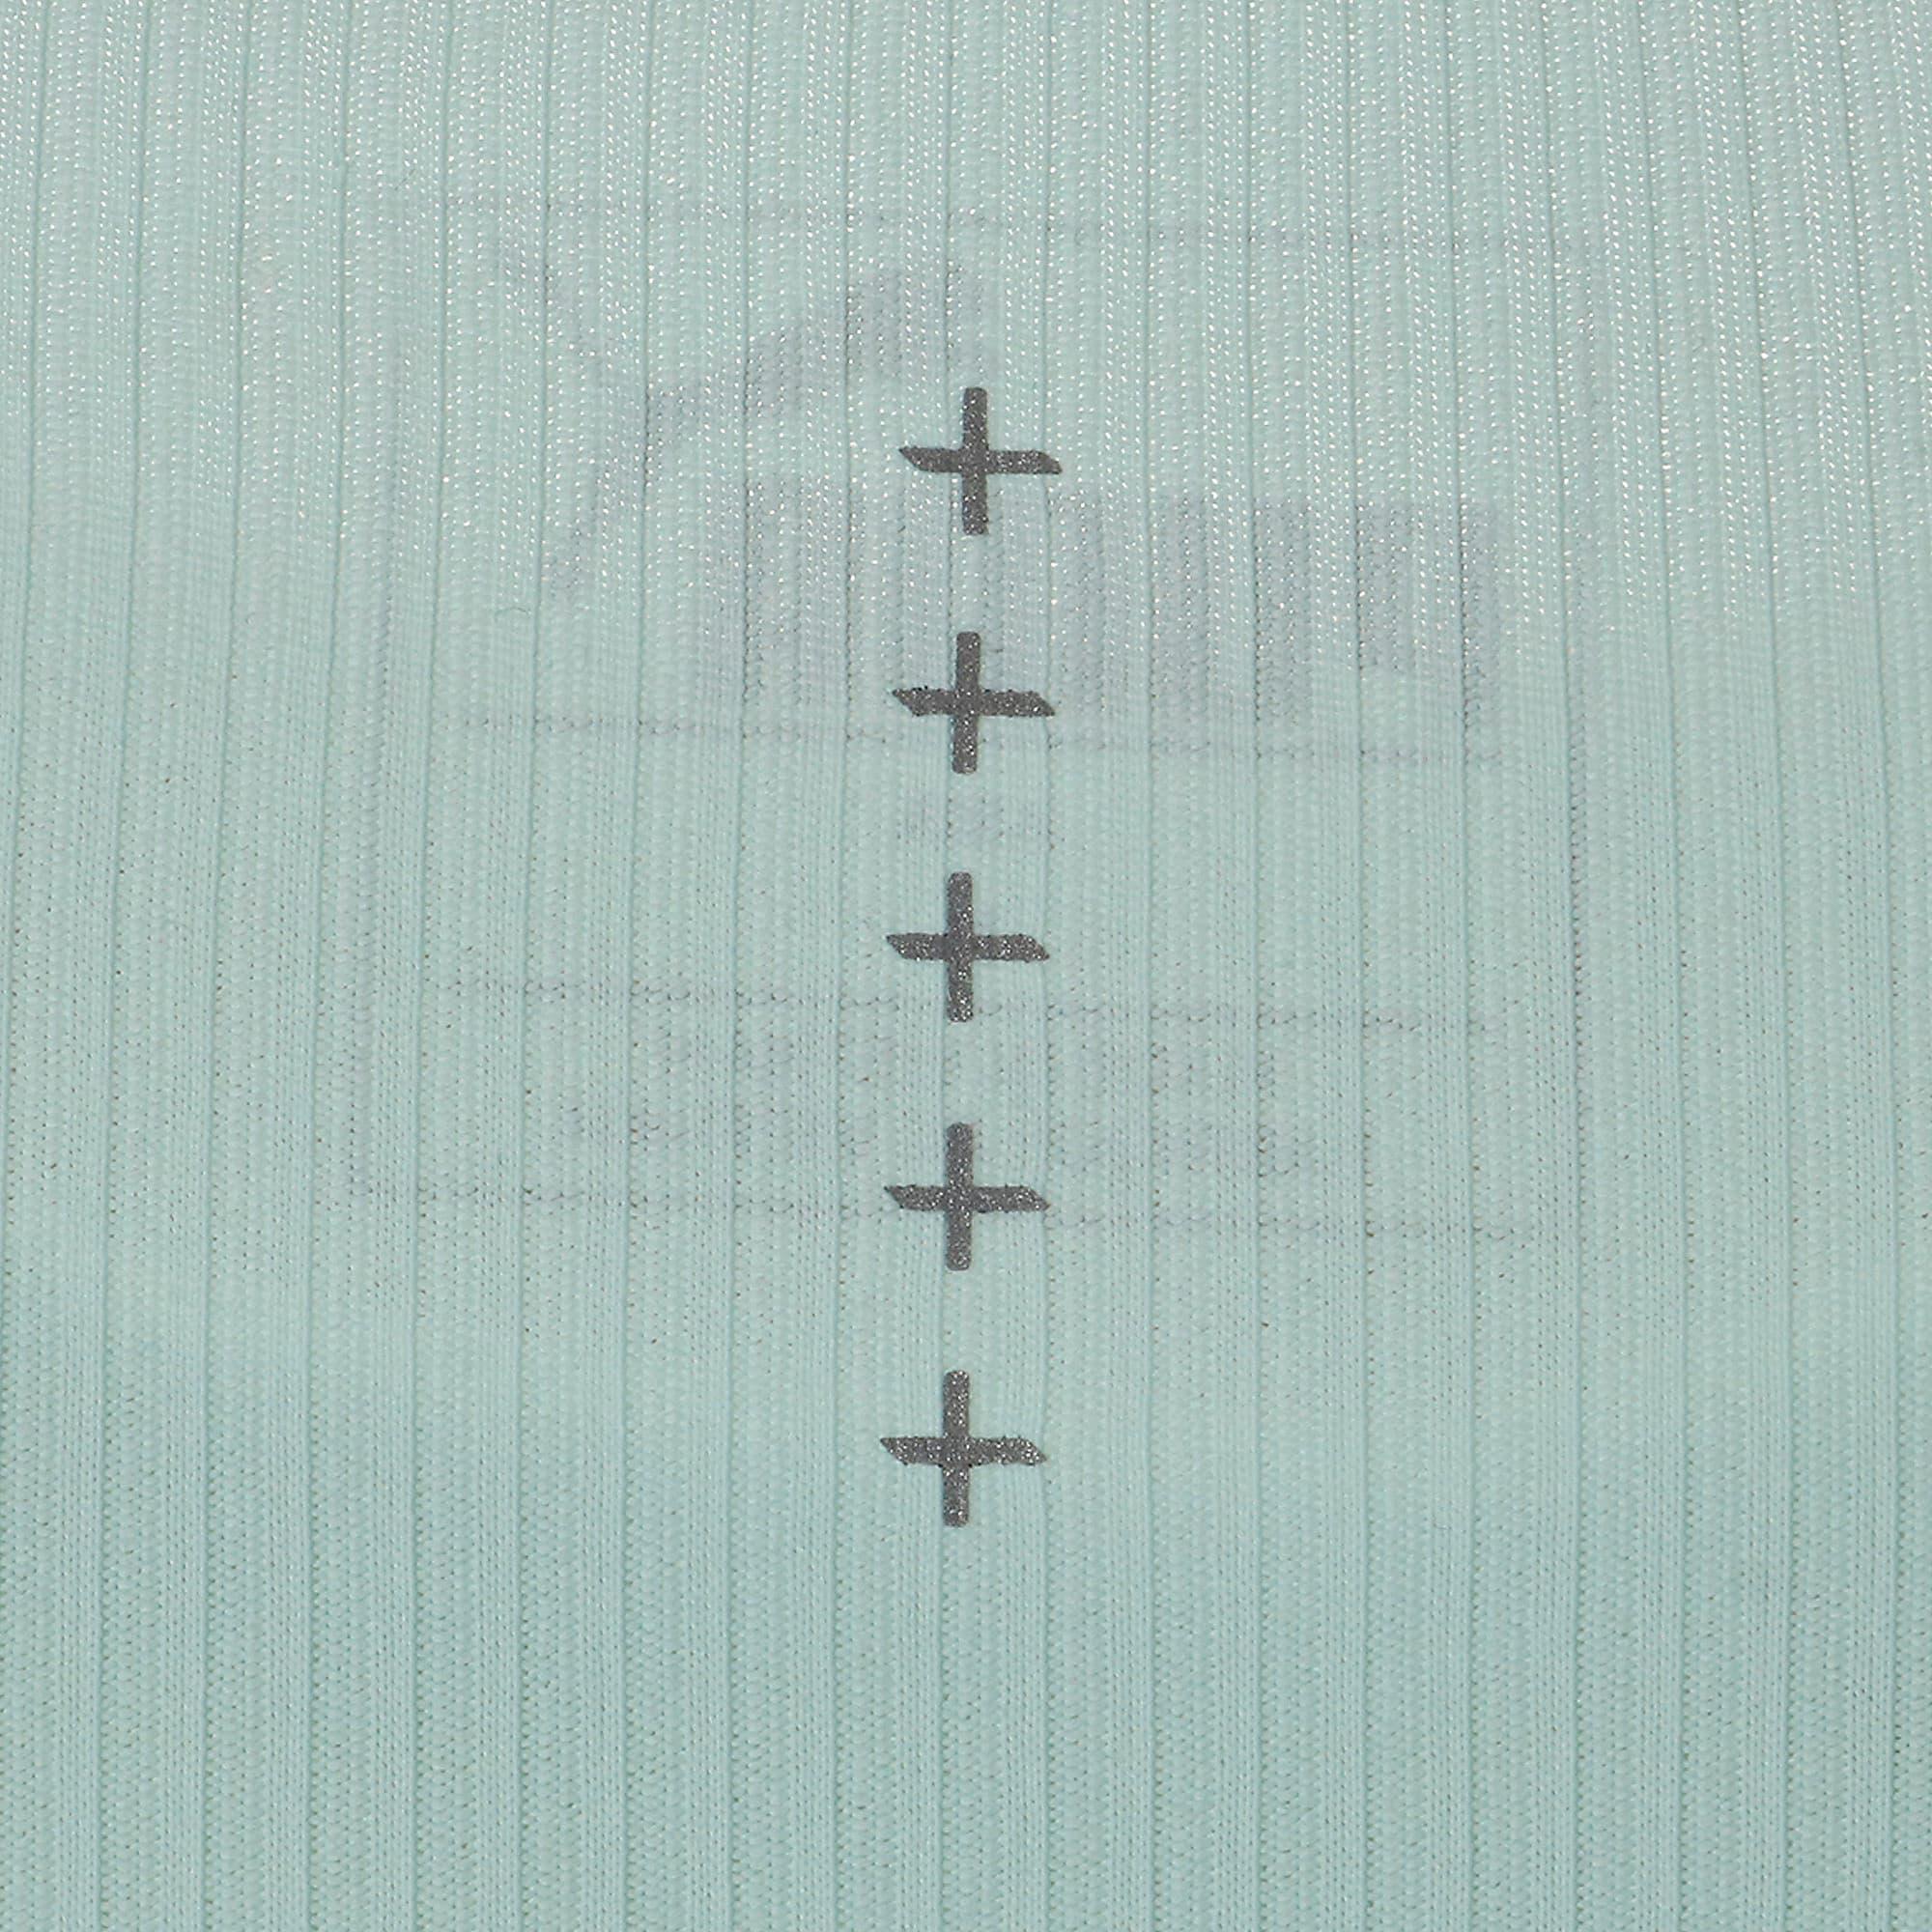 Thumbnail 11 of イグナイト SS ロゴ ウィメンズ Tシャツ 半袖, Fair Aqua, medium-JPN